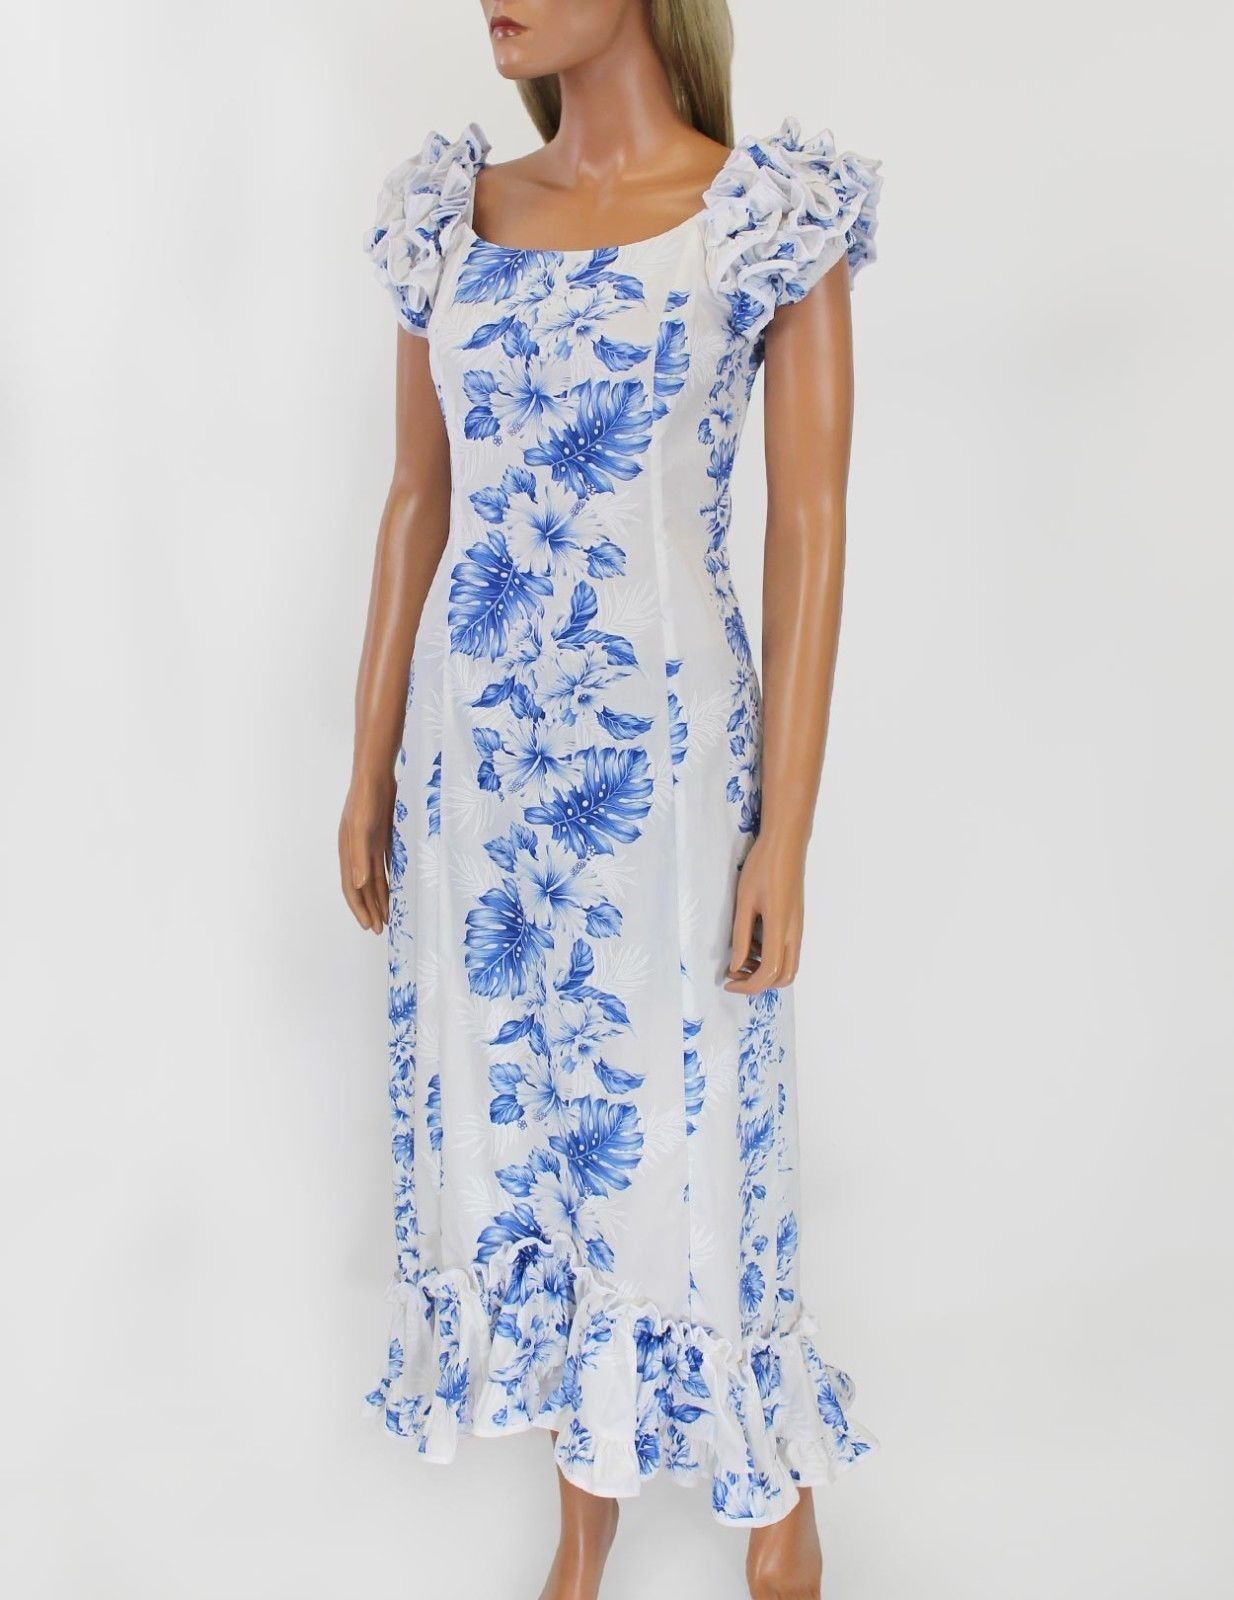 Hawaii Muumuu Dress - Plus Size XS - 3XL Blue/White Floral Aloha ...